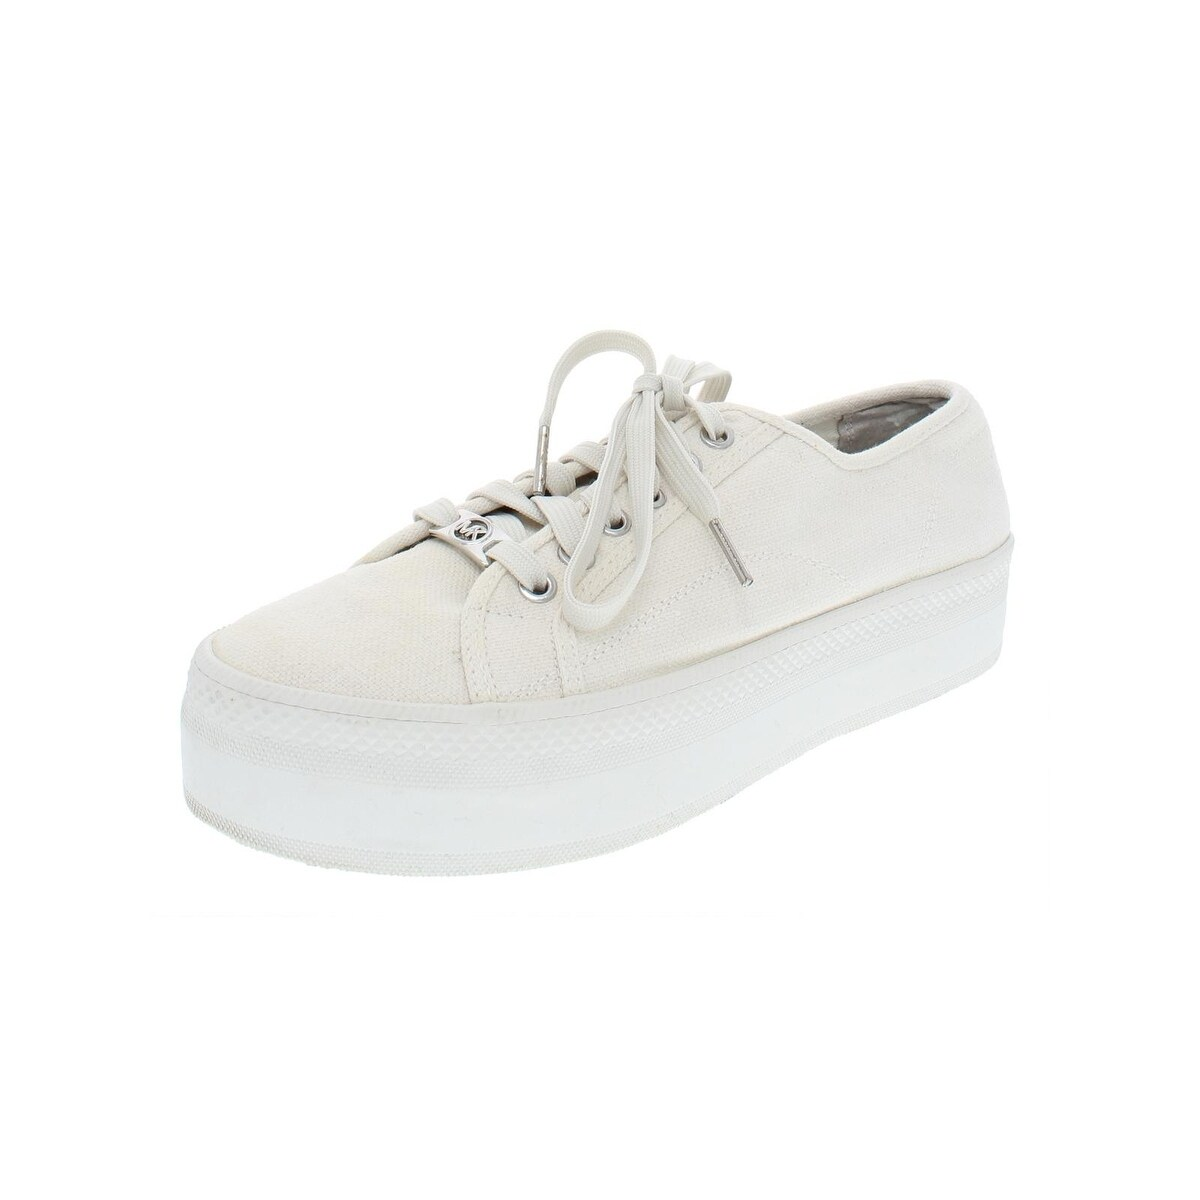 ede430da374 Buy Off-White Women s Sneakers Online at Overstock